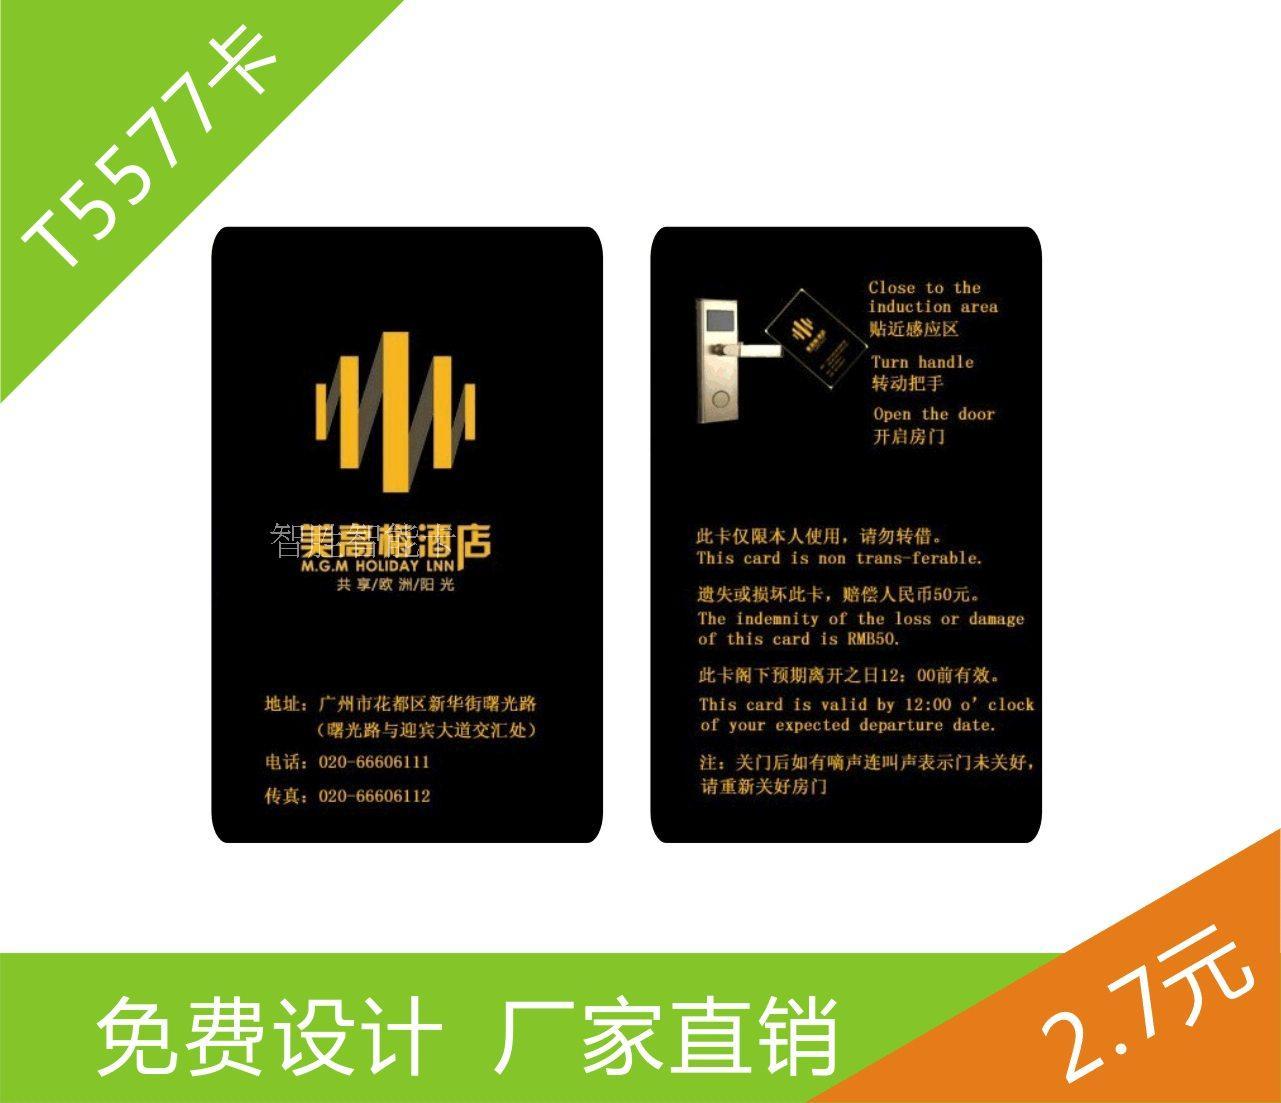 T5577卡 原装T5577卡 T5577门锁卡 酒店门卡 宾馆门卡印刷